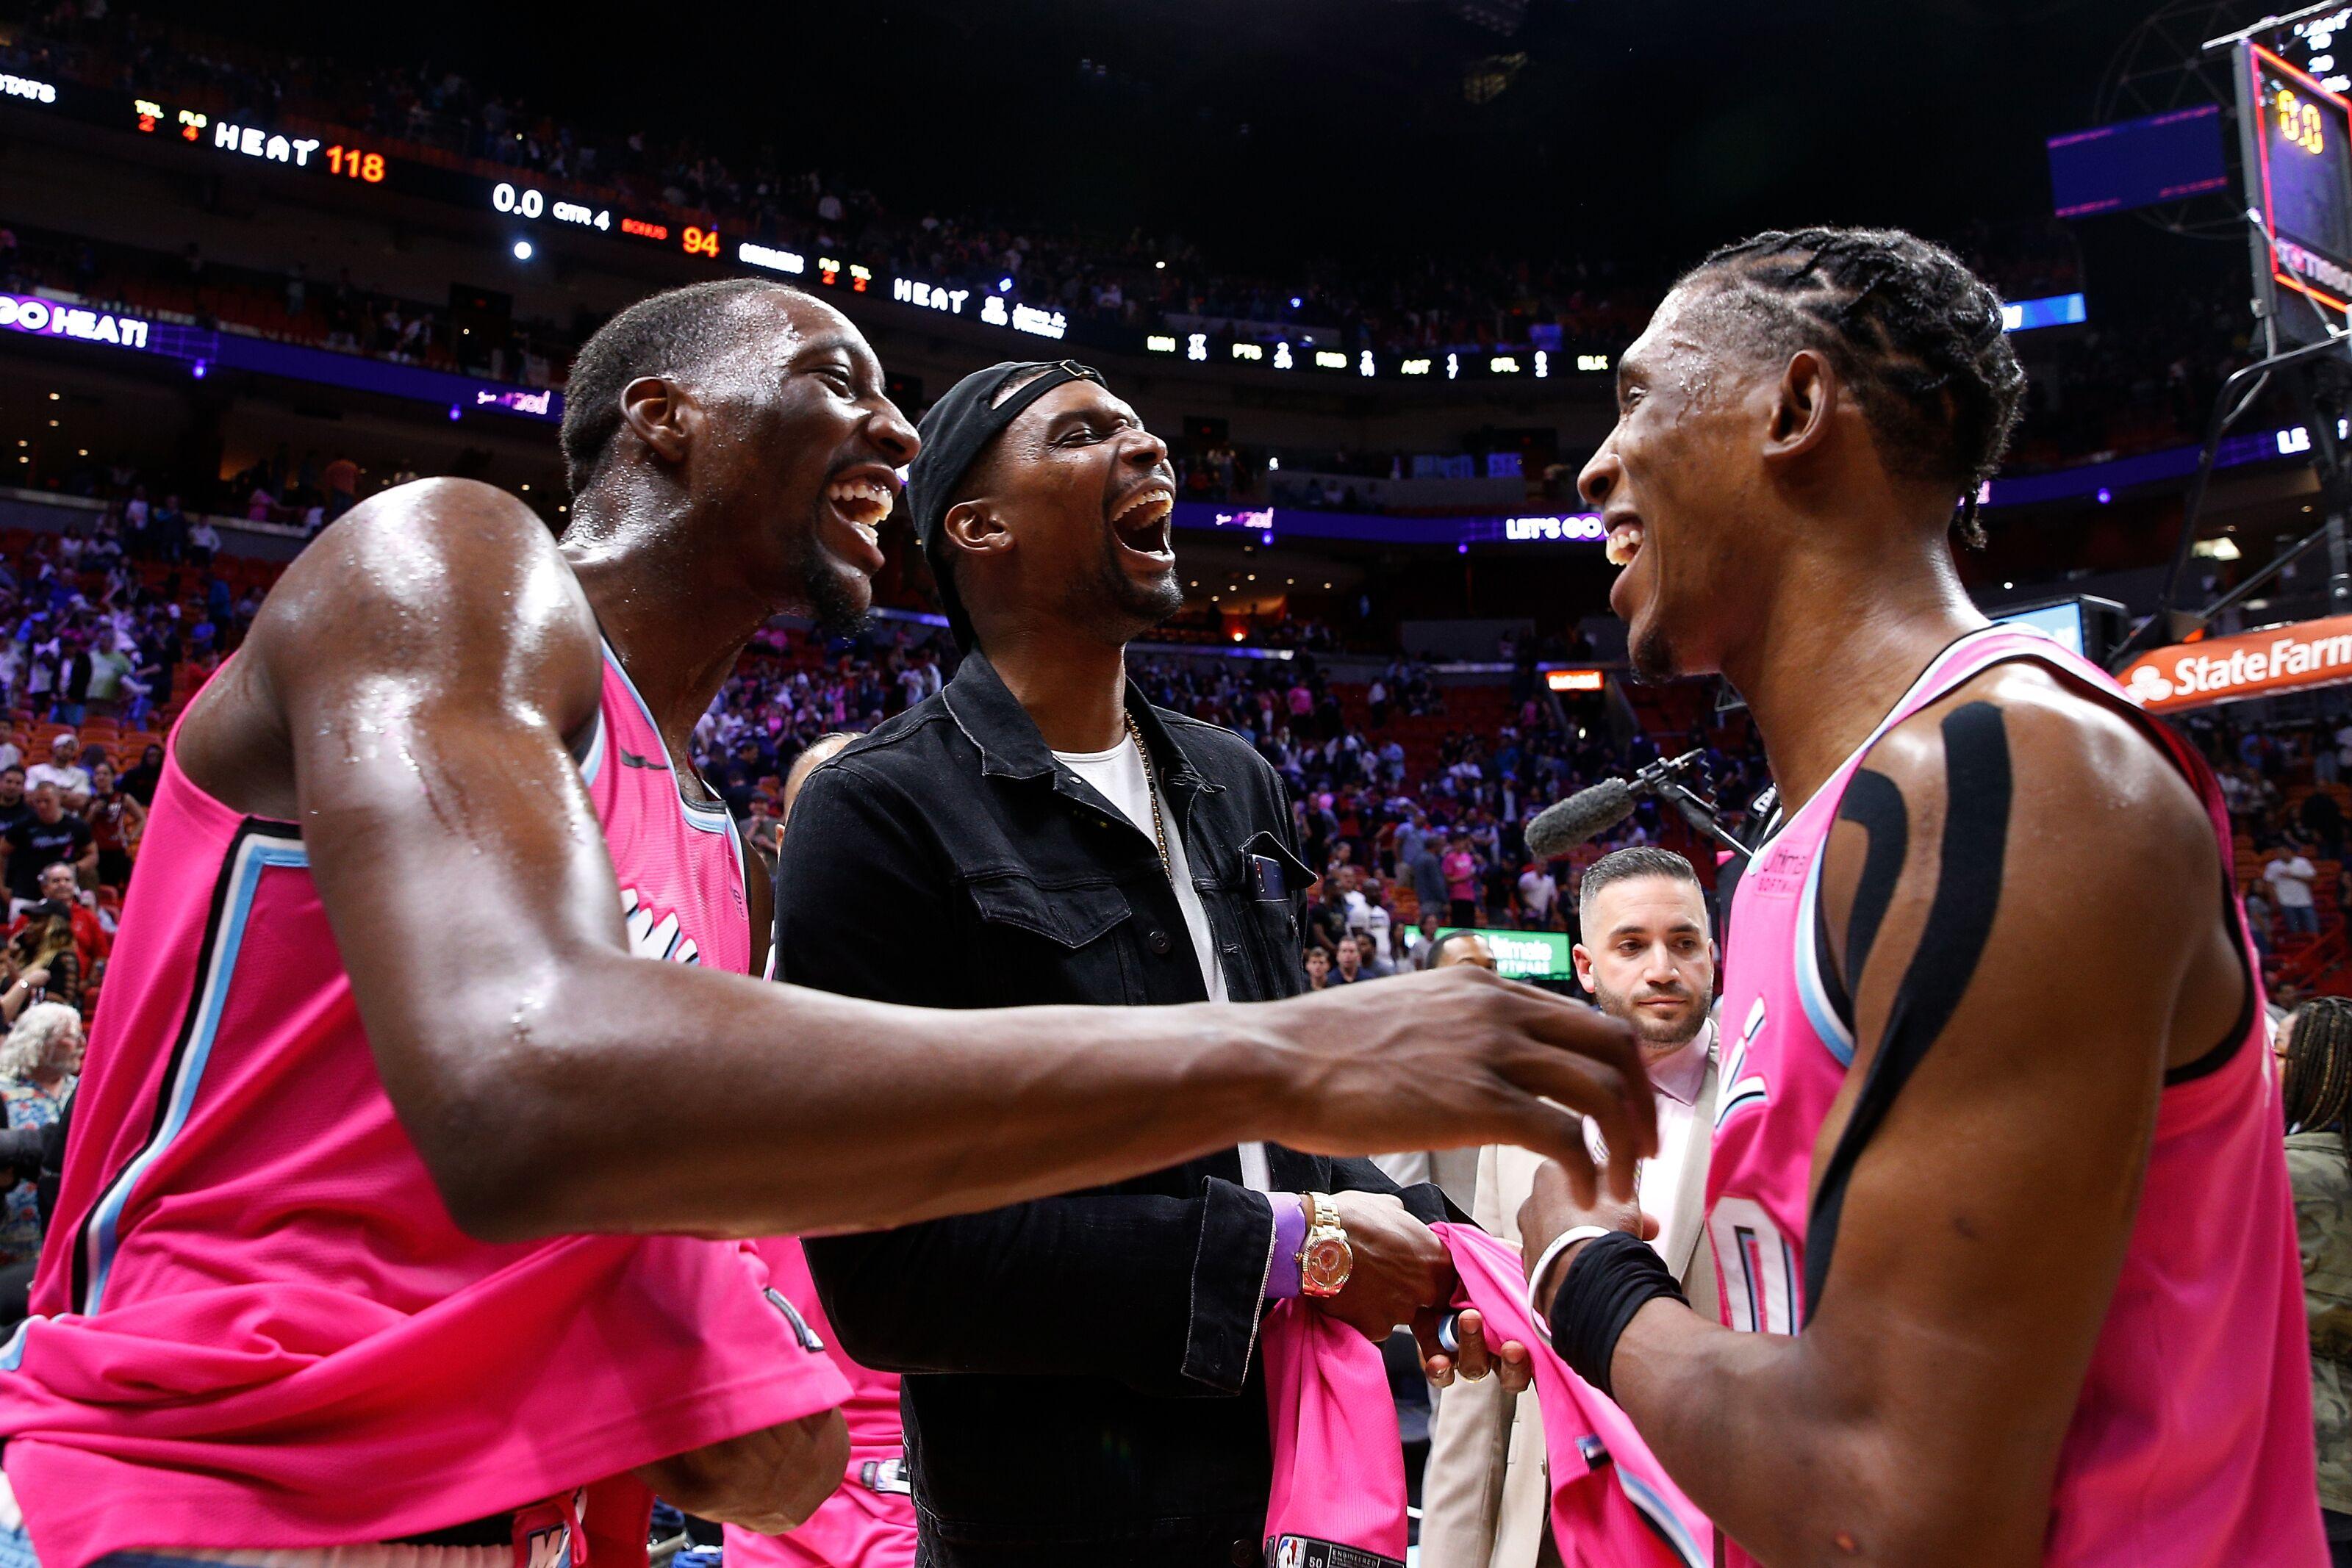 Miami Heat Hot Topics: Draft spot set, Heat Check update, Mike Conley trade?